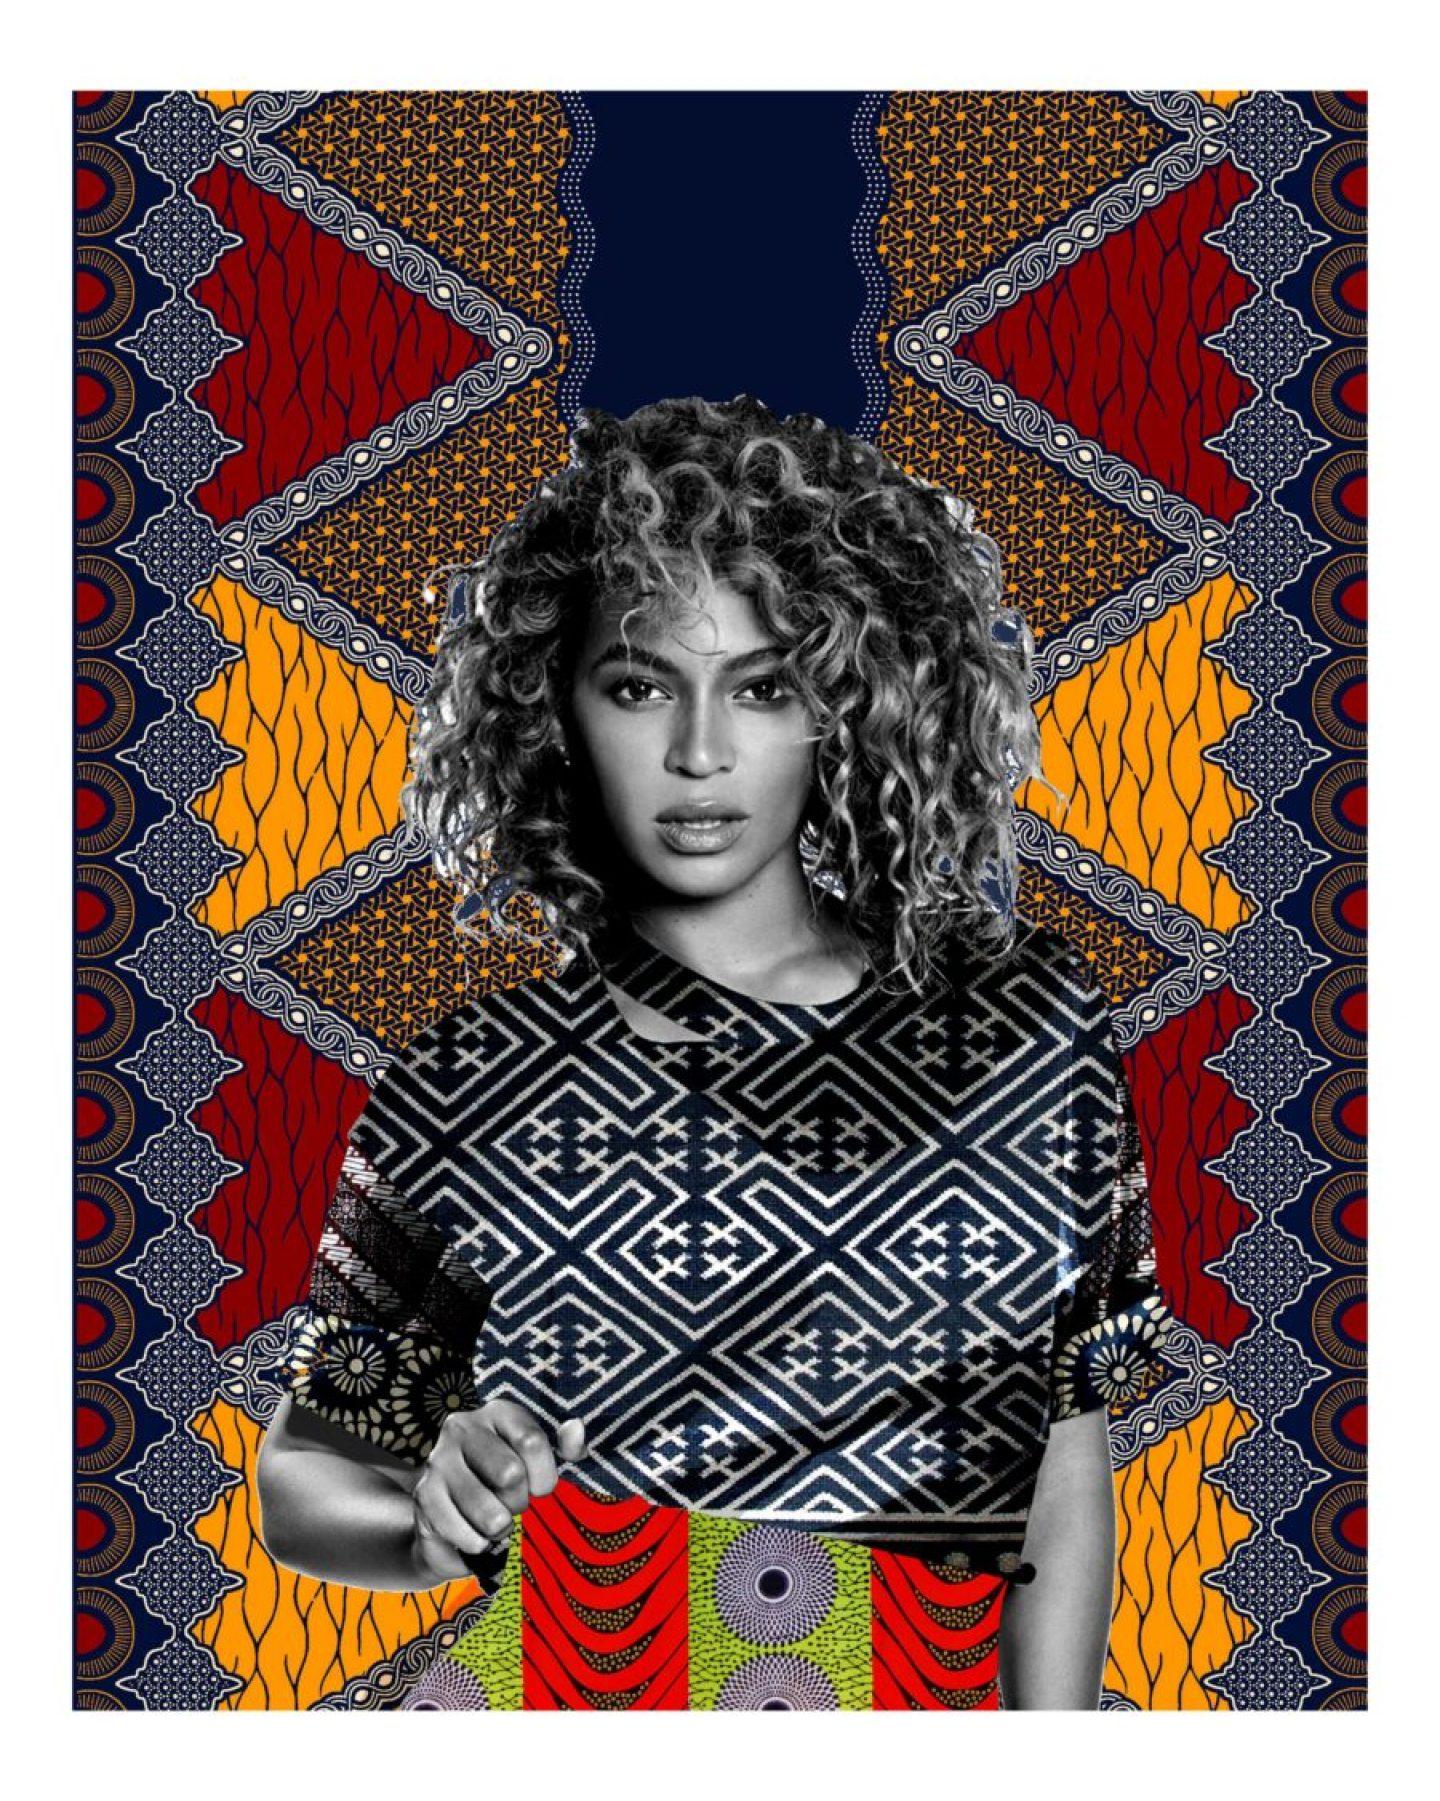 Original-Bey-Beyonce-by-Makeba-KEEBS-Rainey_noframe-1440x1801 Makeeba KEEBS Rainey Art Featured in Absolut Art